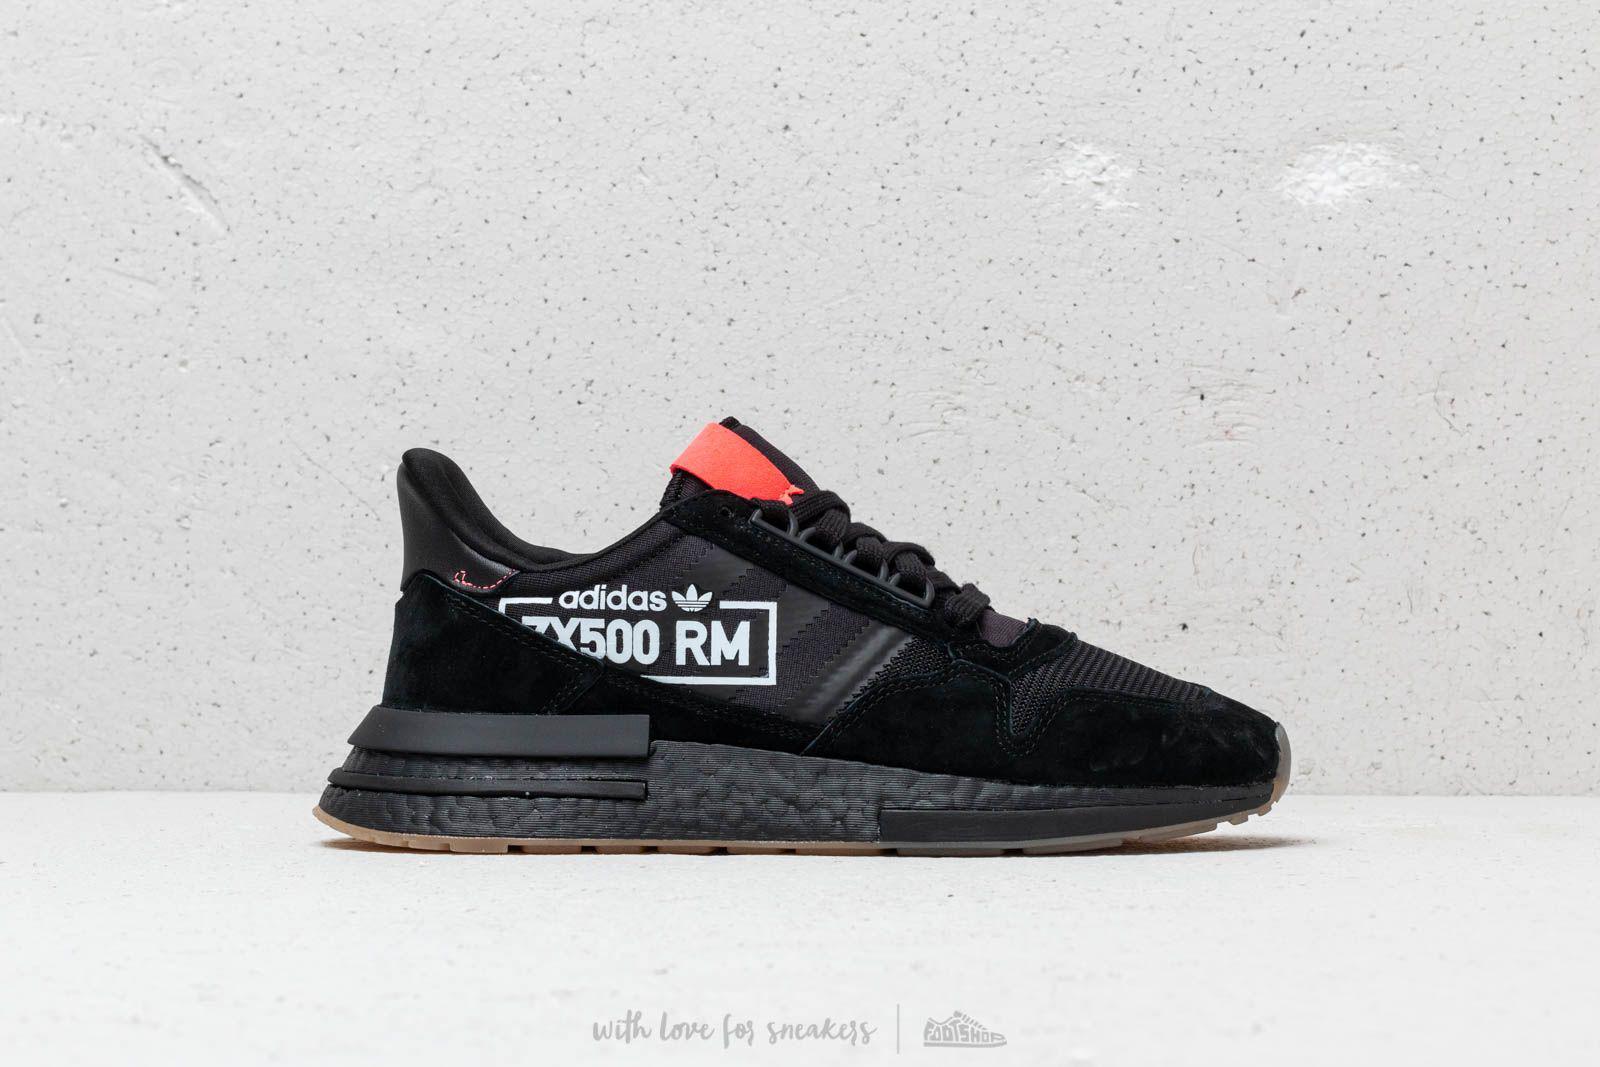 5c0533612330 Adidas Originals - Adidas Zx 500 Rm Core Black  Core Black  Bluebird for  Men. View fullscreen